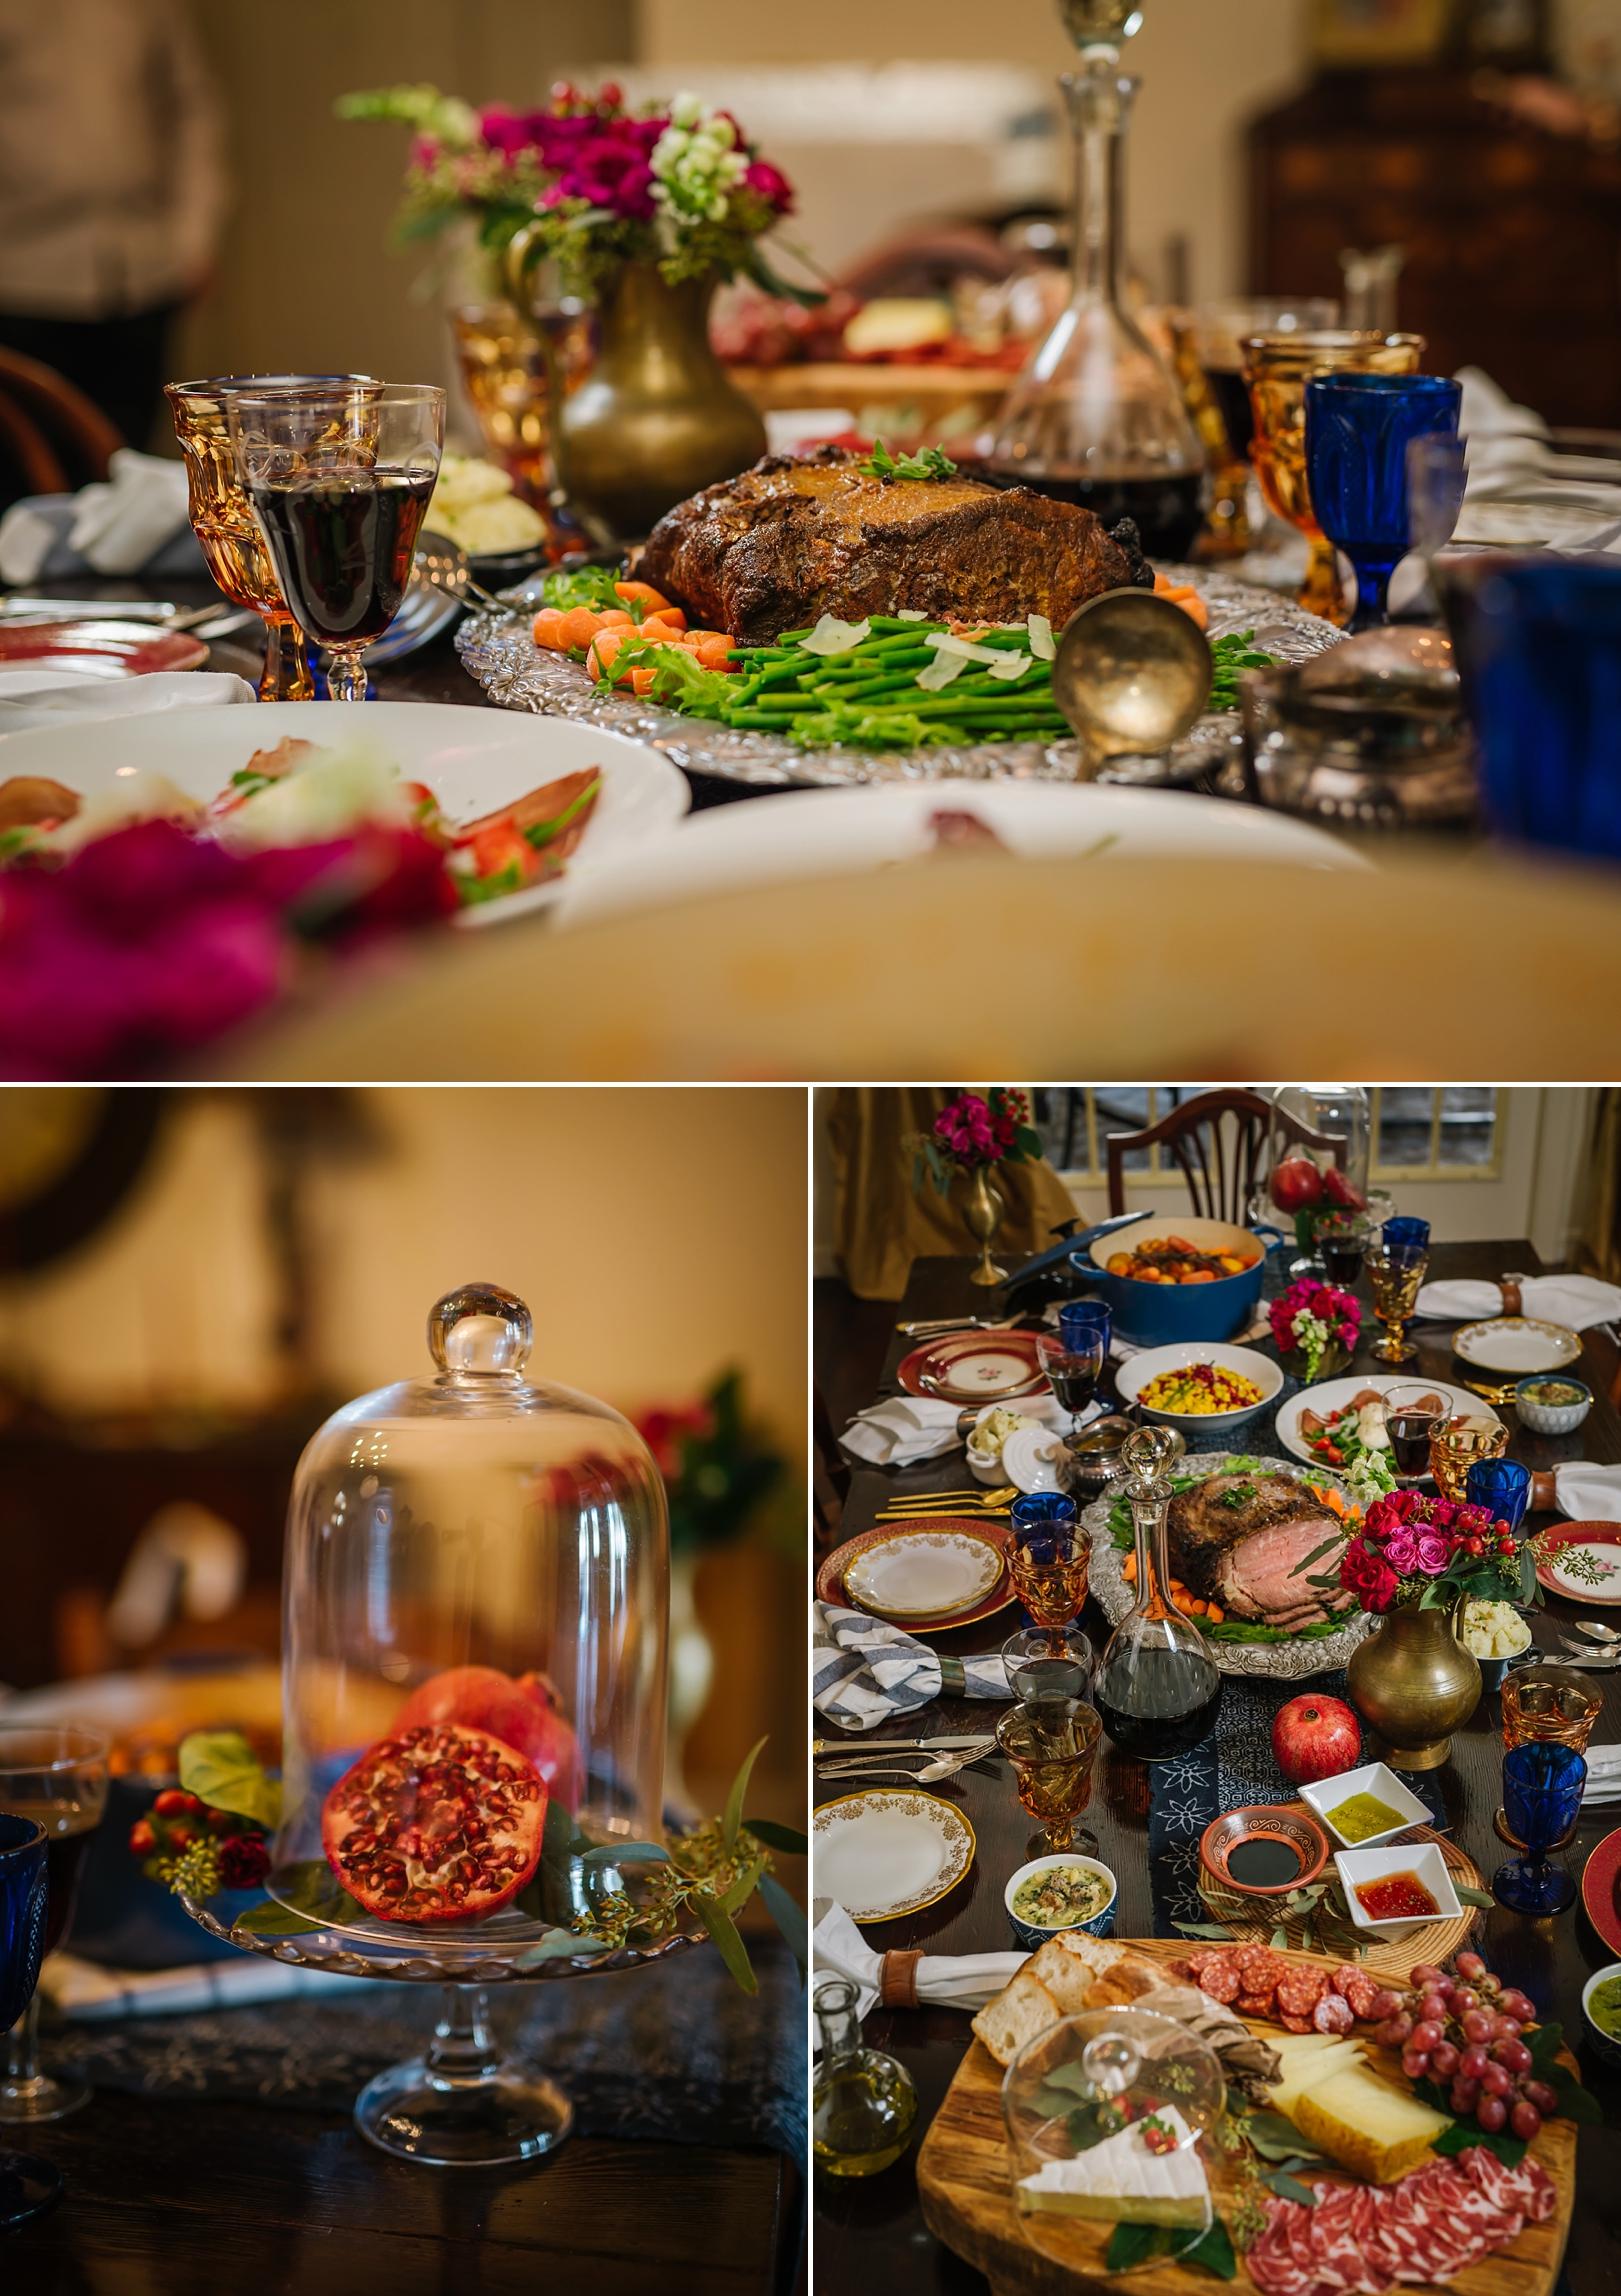 tampa-creative-commercial-food-photographer-ashlee-hamon_0005.jpg